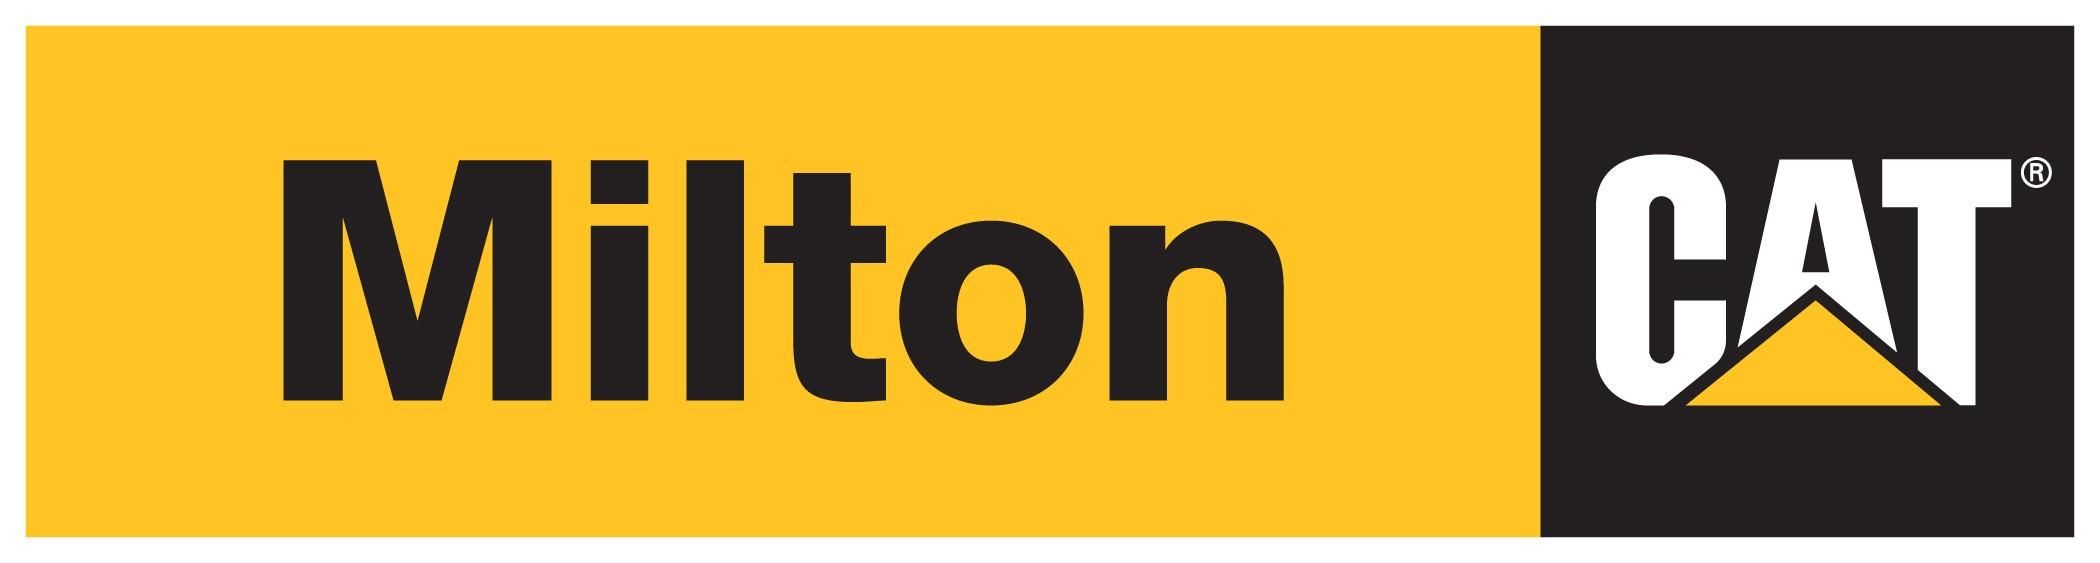 milton-cat-logo